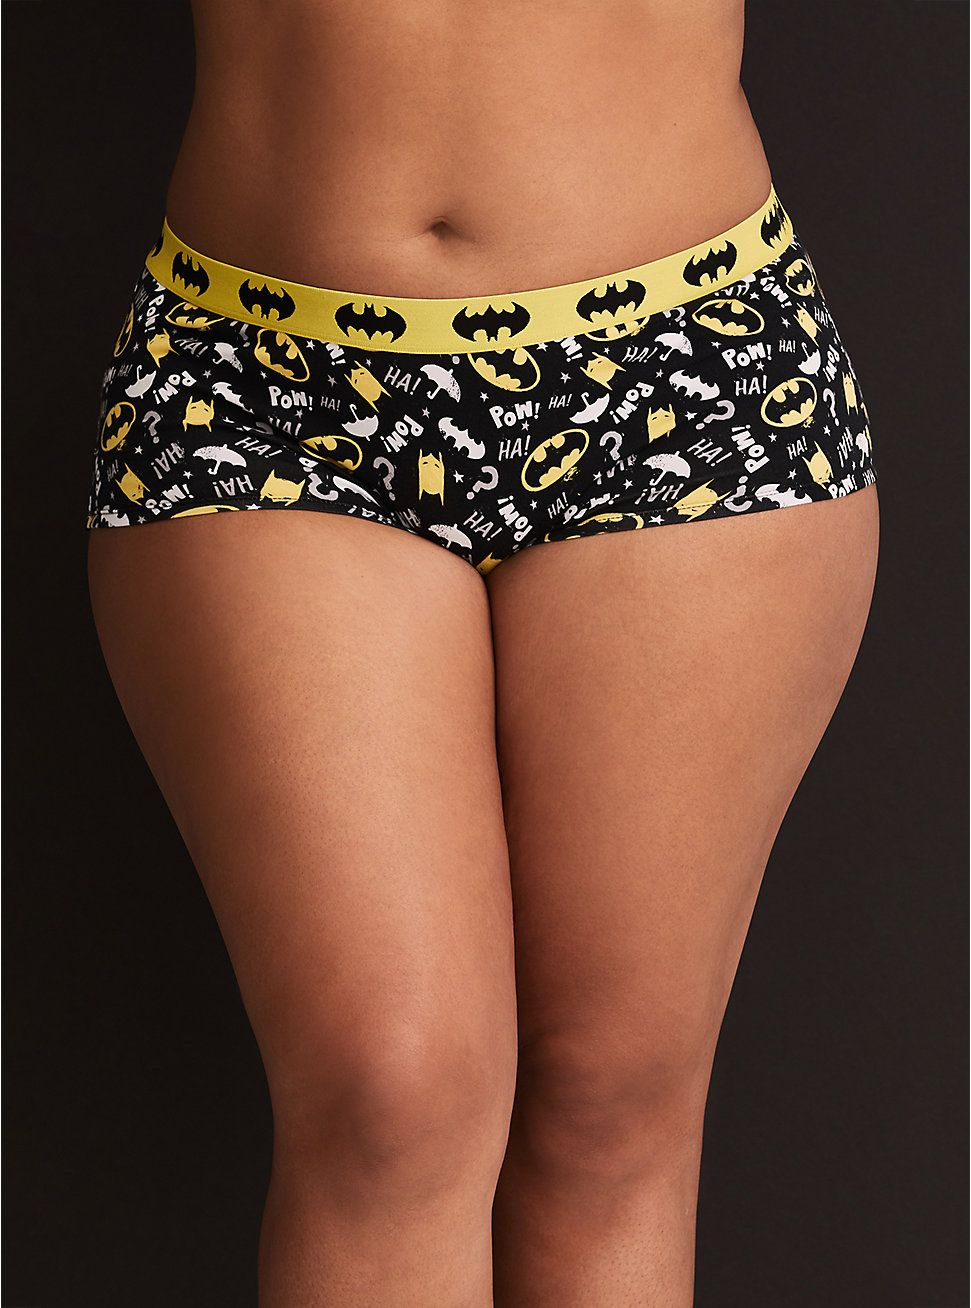 e910995dabd Plus Size Batman Cotton Boyshort Panty